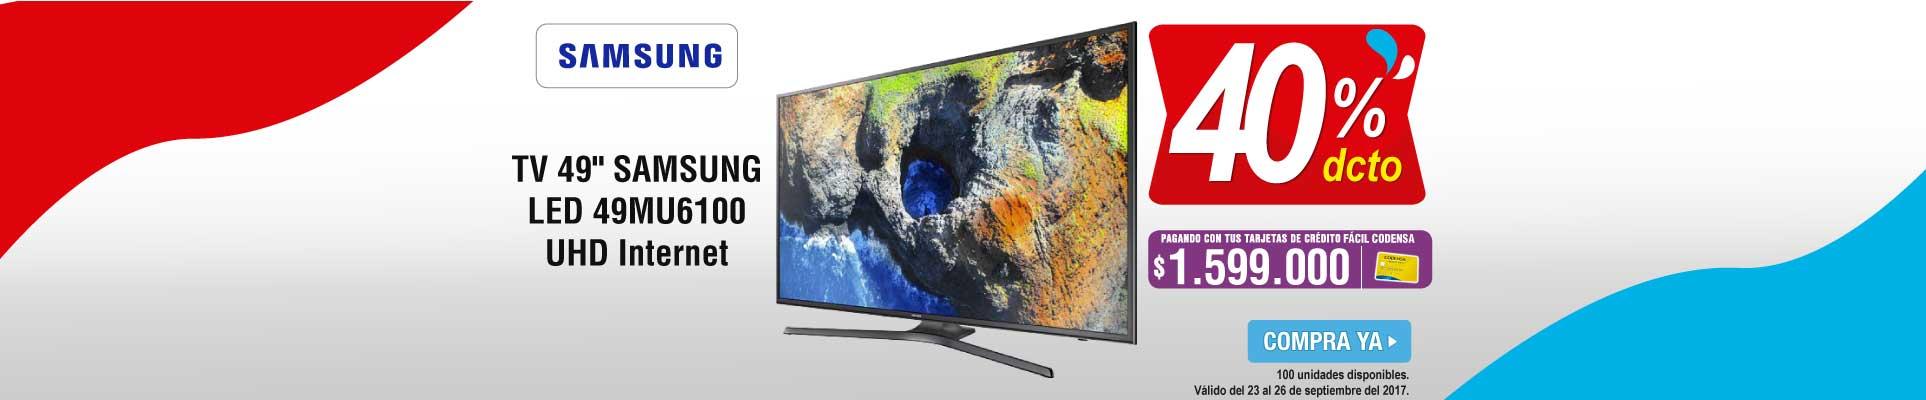 PPAL ALKP-5-tv-TV 49 123cm SAMSUNG LED 49MU6100 UHD Internet-prod-septiembre23-26